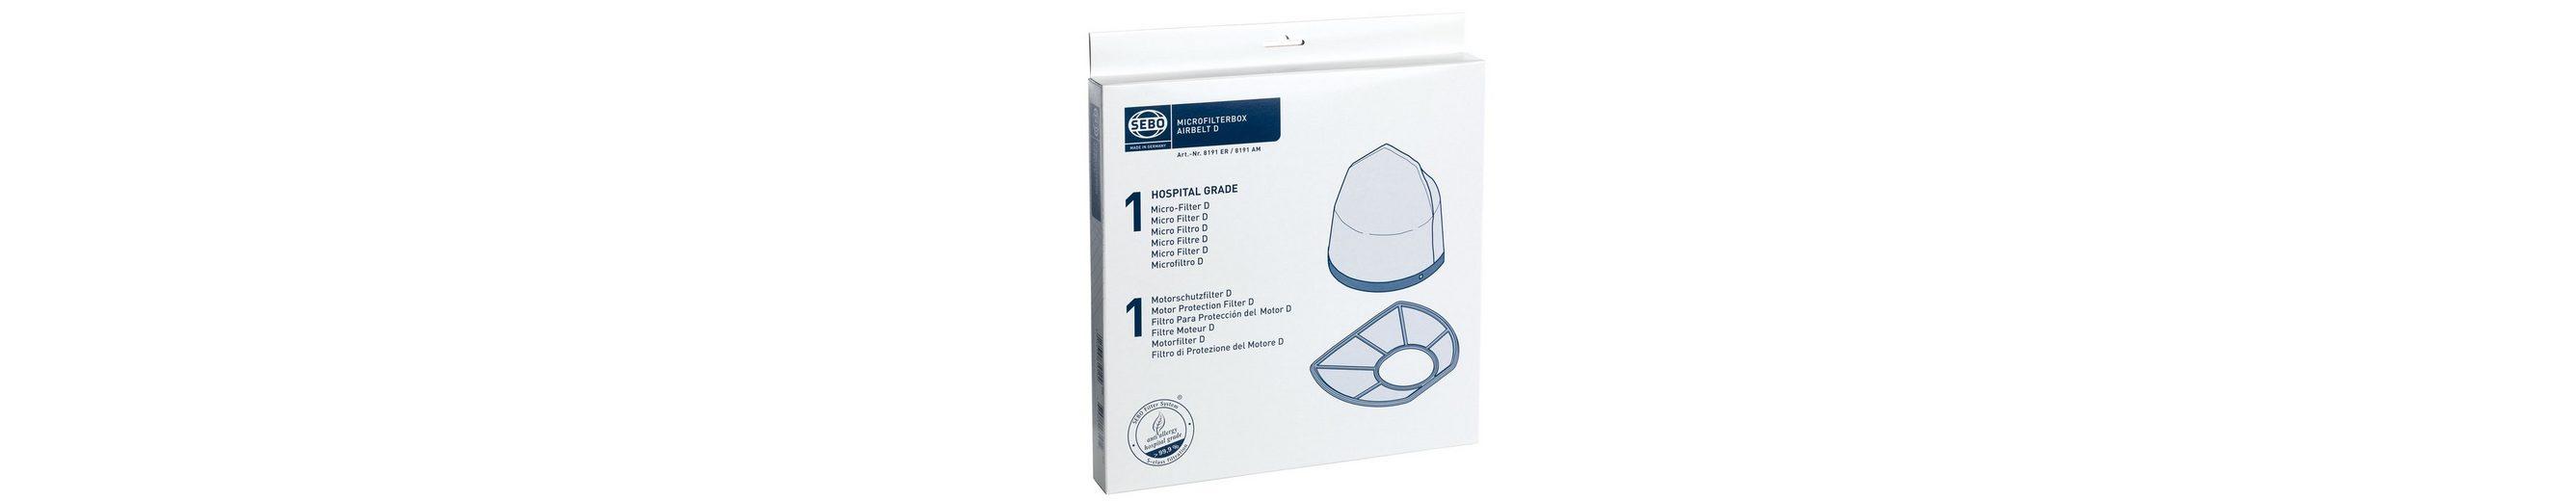 Sebo Microfilterbox »Airbelt D«